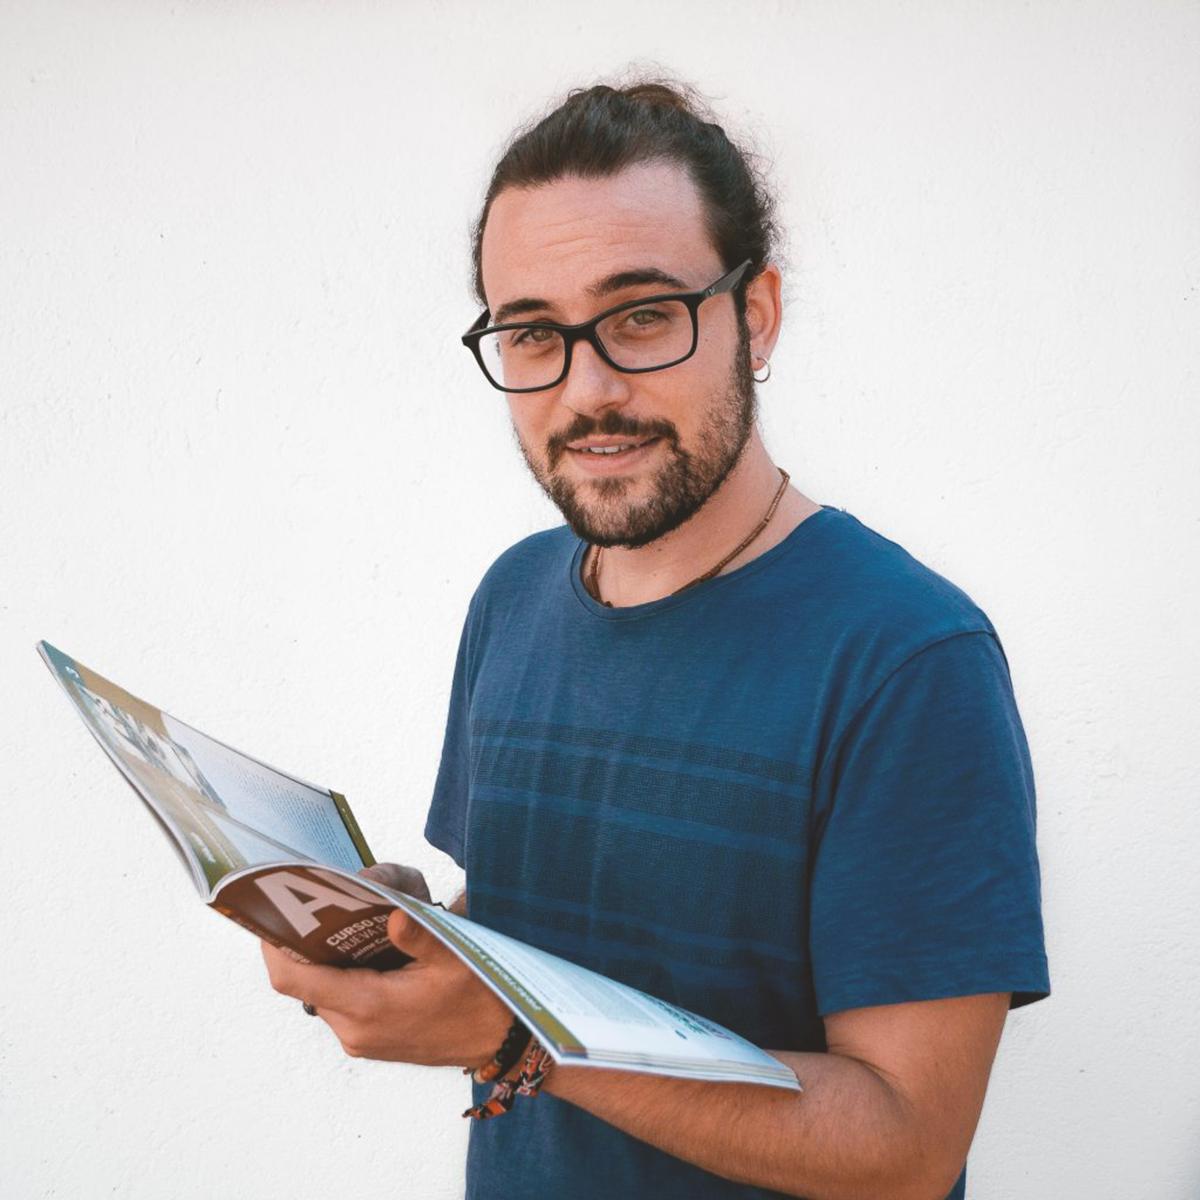 Iván Capilla Bertos